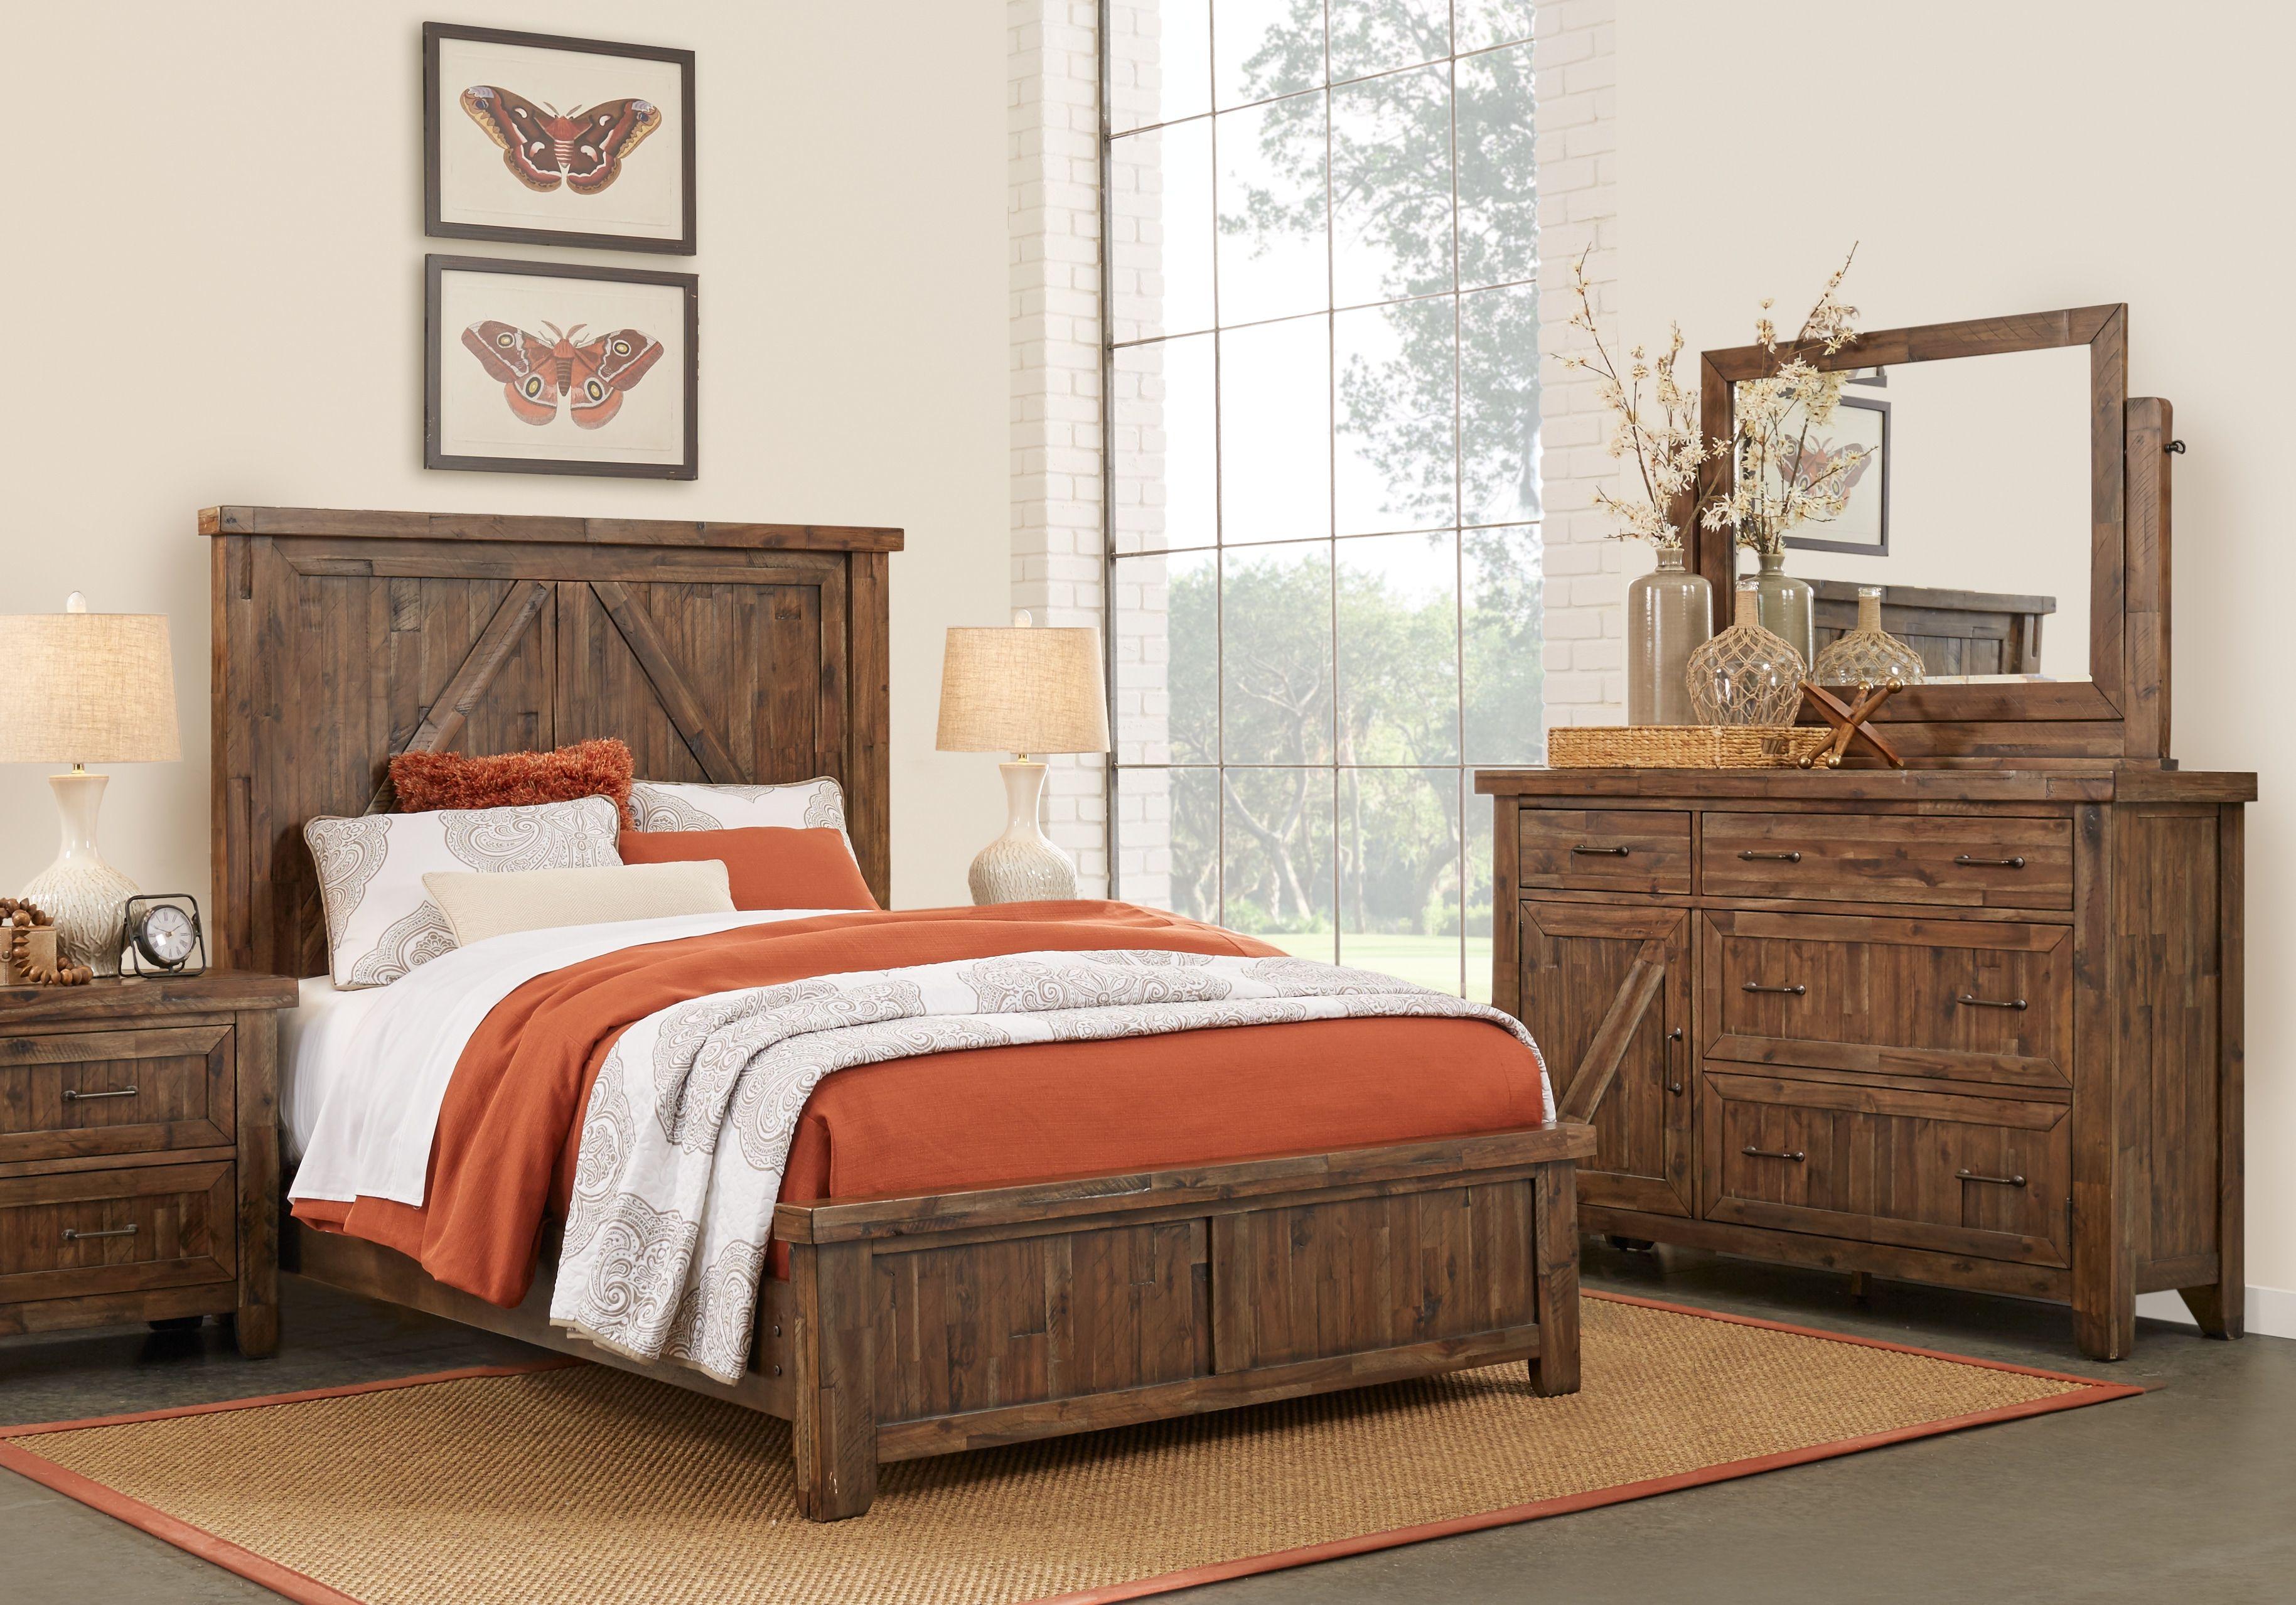 Fieldcreek Brown 7 Pc Queen Panel Bedroom | King size ...